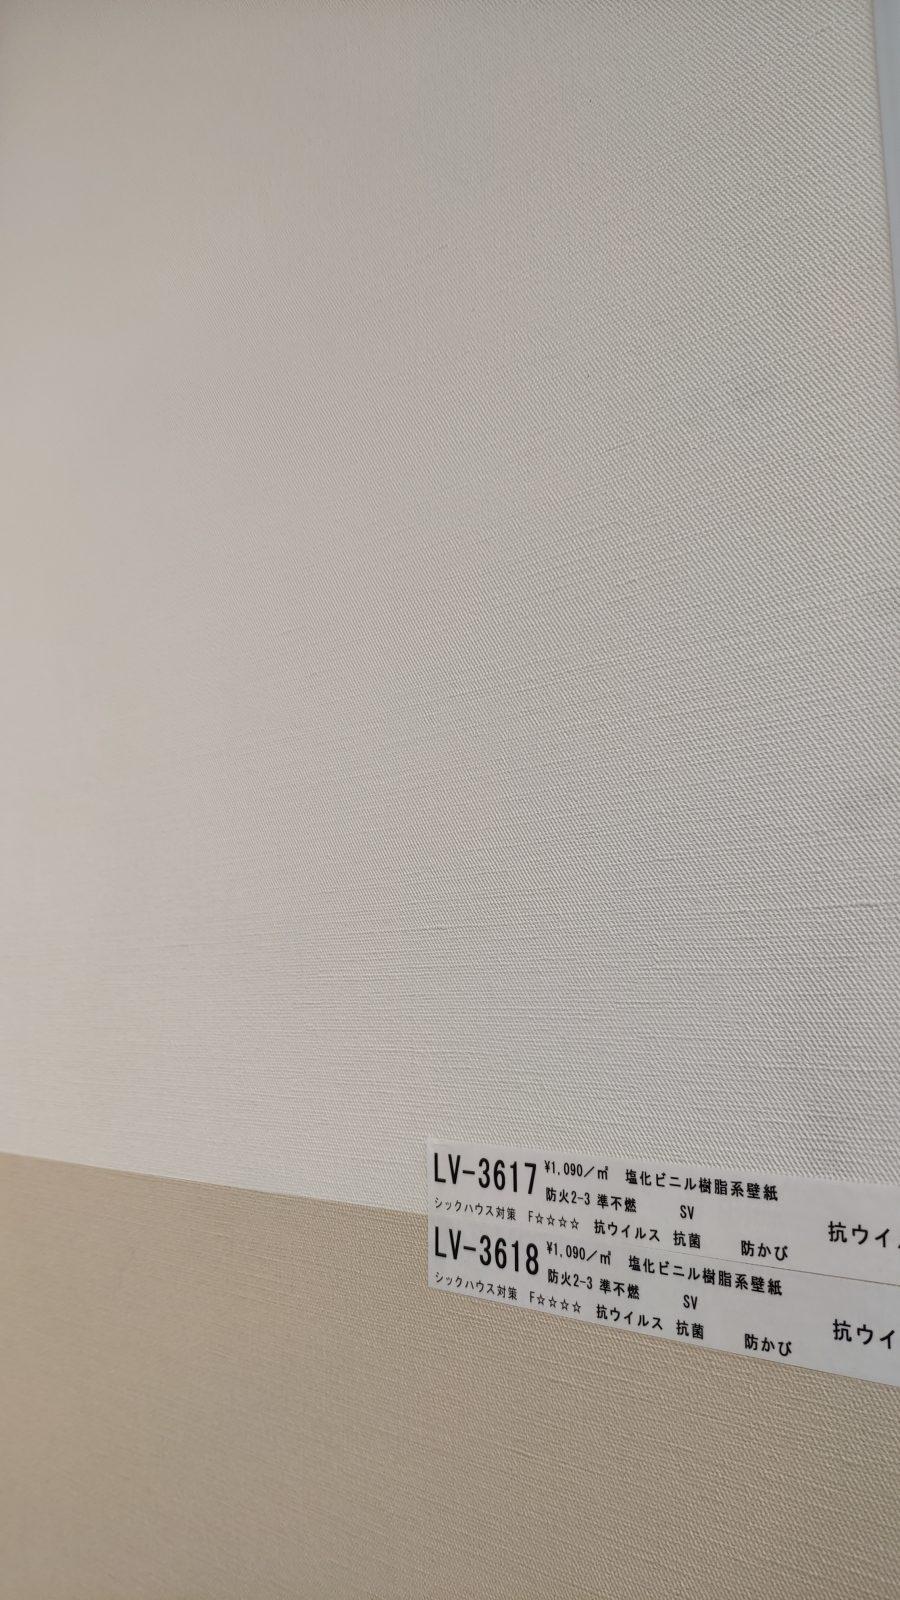 LV-3617(LTS423) / LV-3618